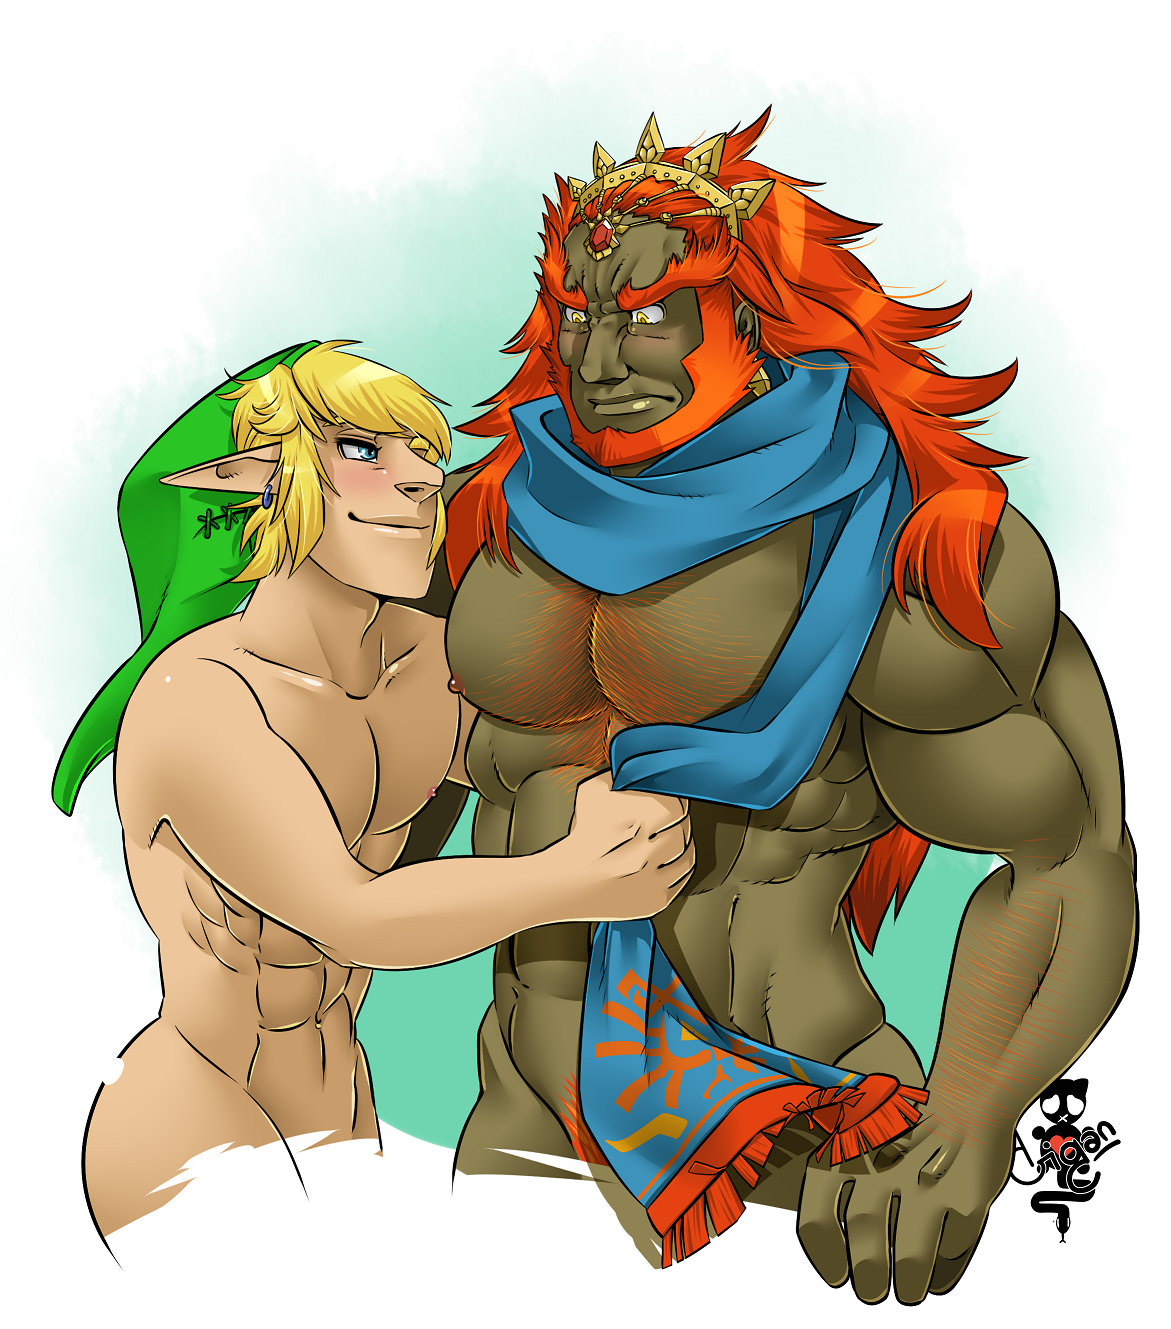 Demon king damao porn sex image